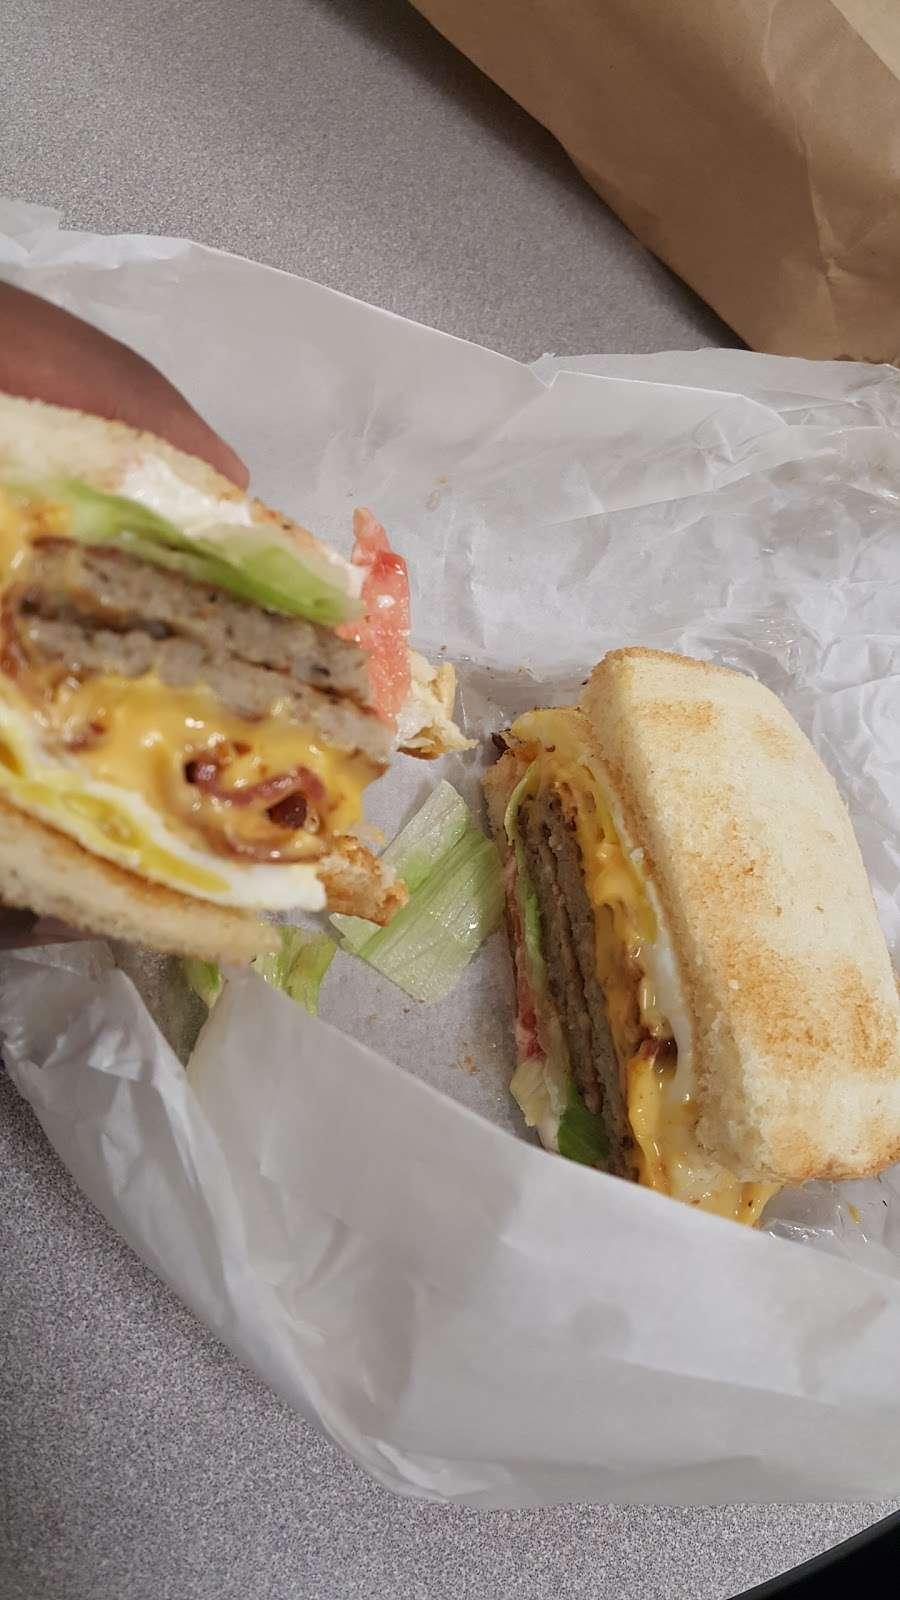 Johnnys Subs & Sundae Shop - restaurant  | Photo 9 of 9 | Address: 1124 E Main St, Salisbury, MD 21804, USA | Phone: (410) 860-5447